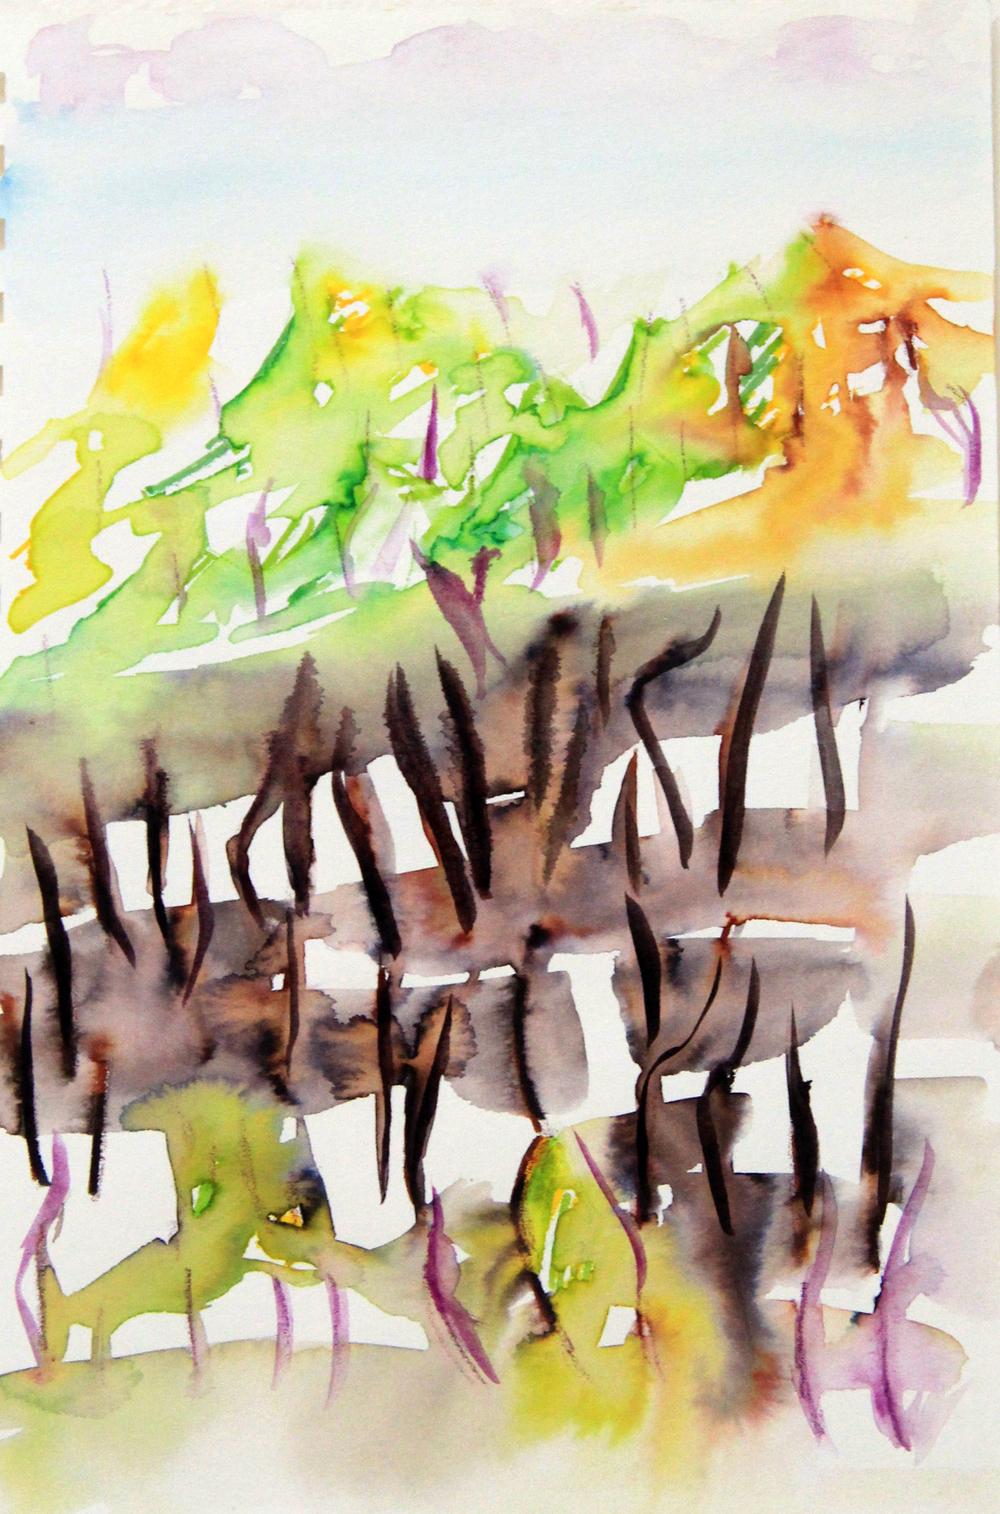 Mangroves_From_The_Water_74_Zahidah_Zeytoun_Showcase.jpg.jpg